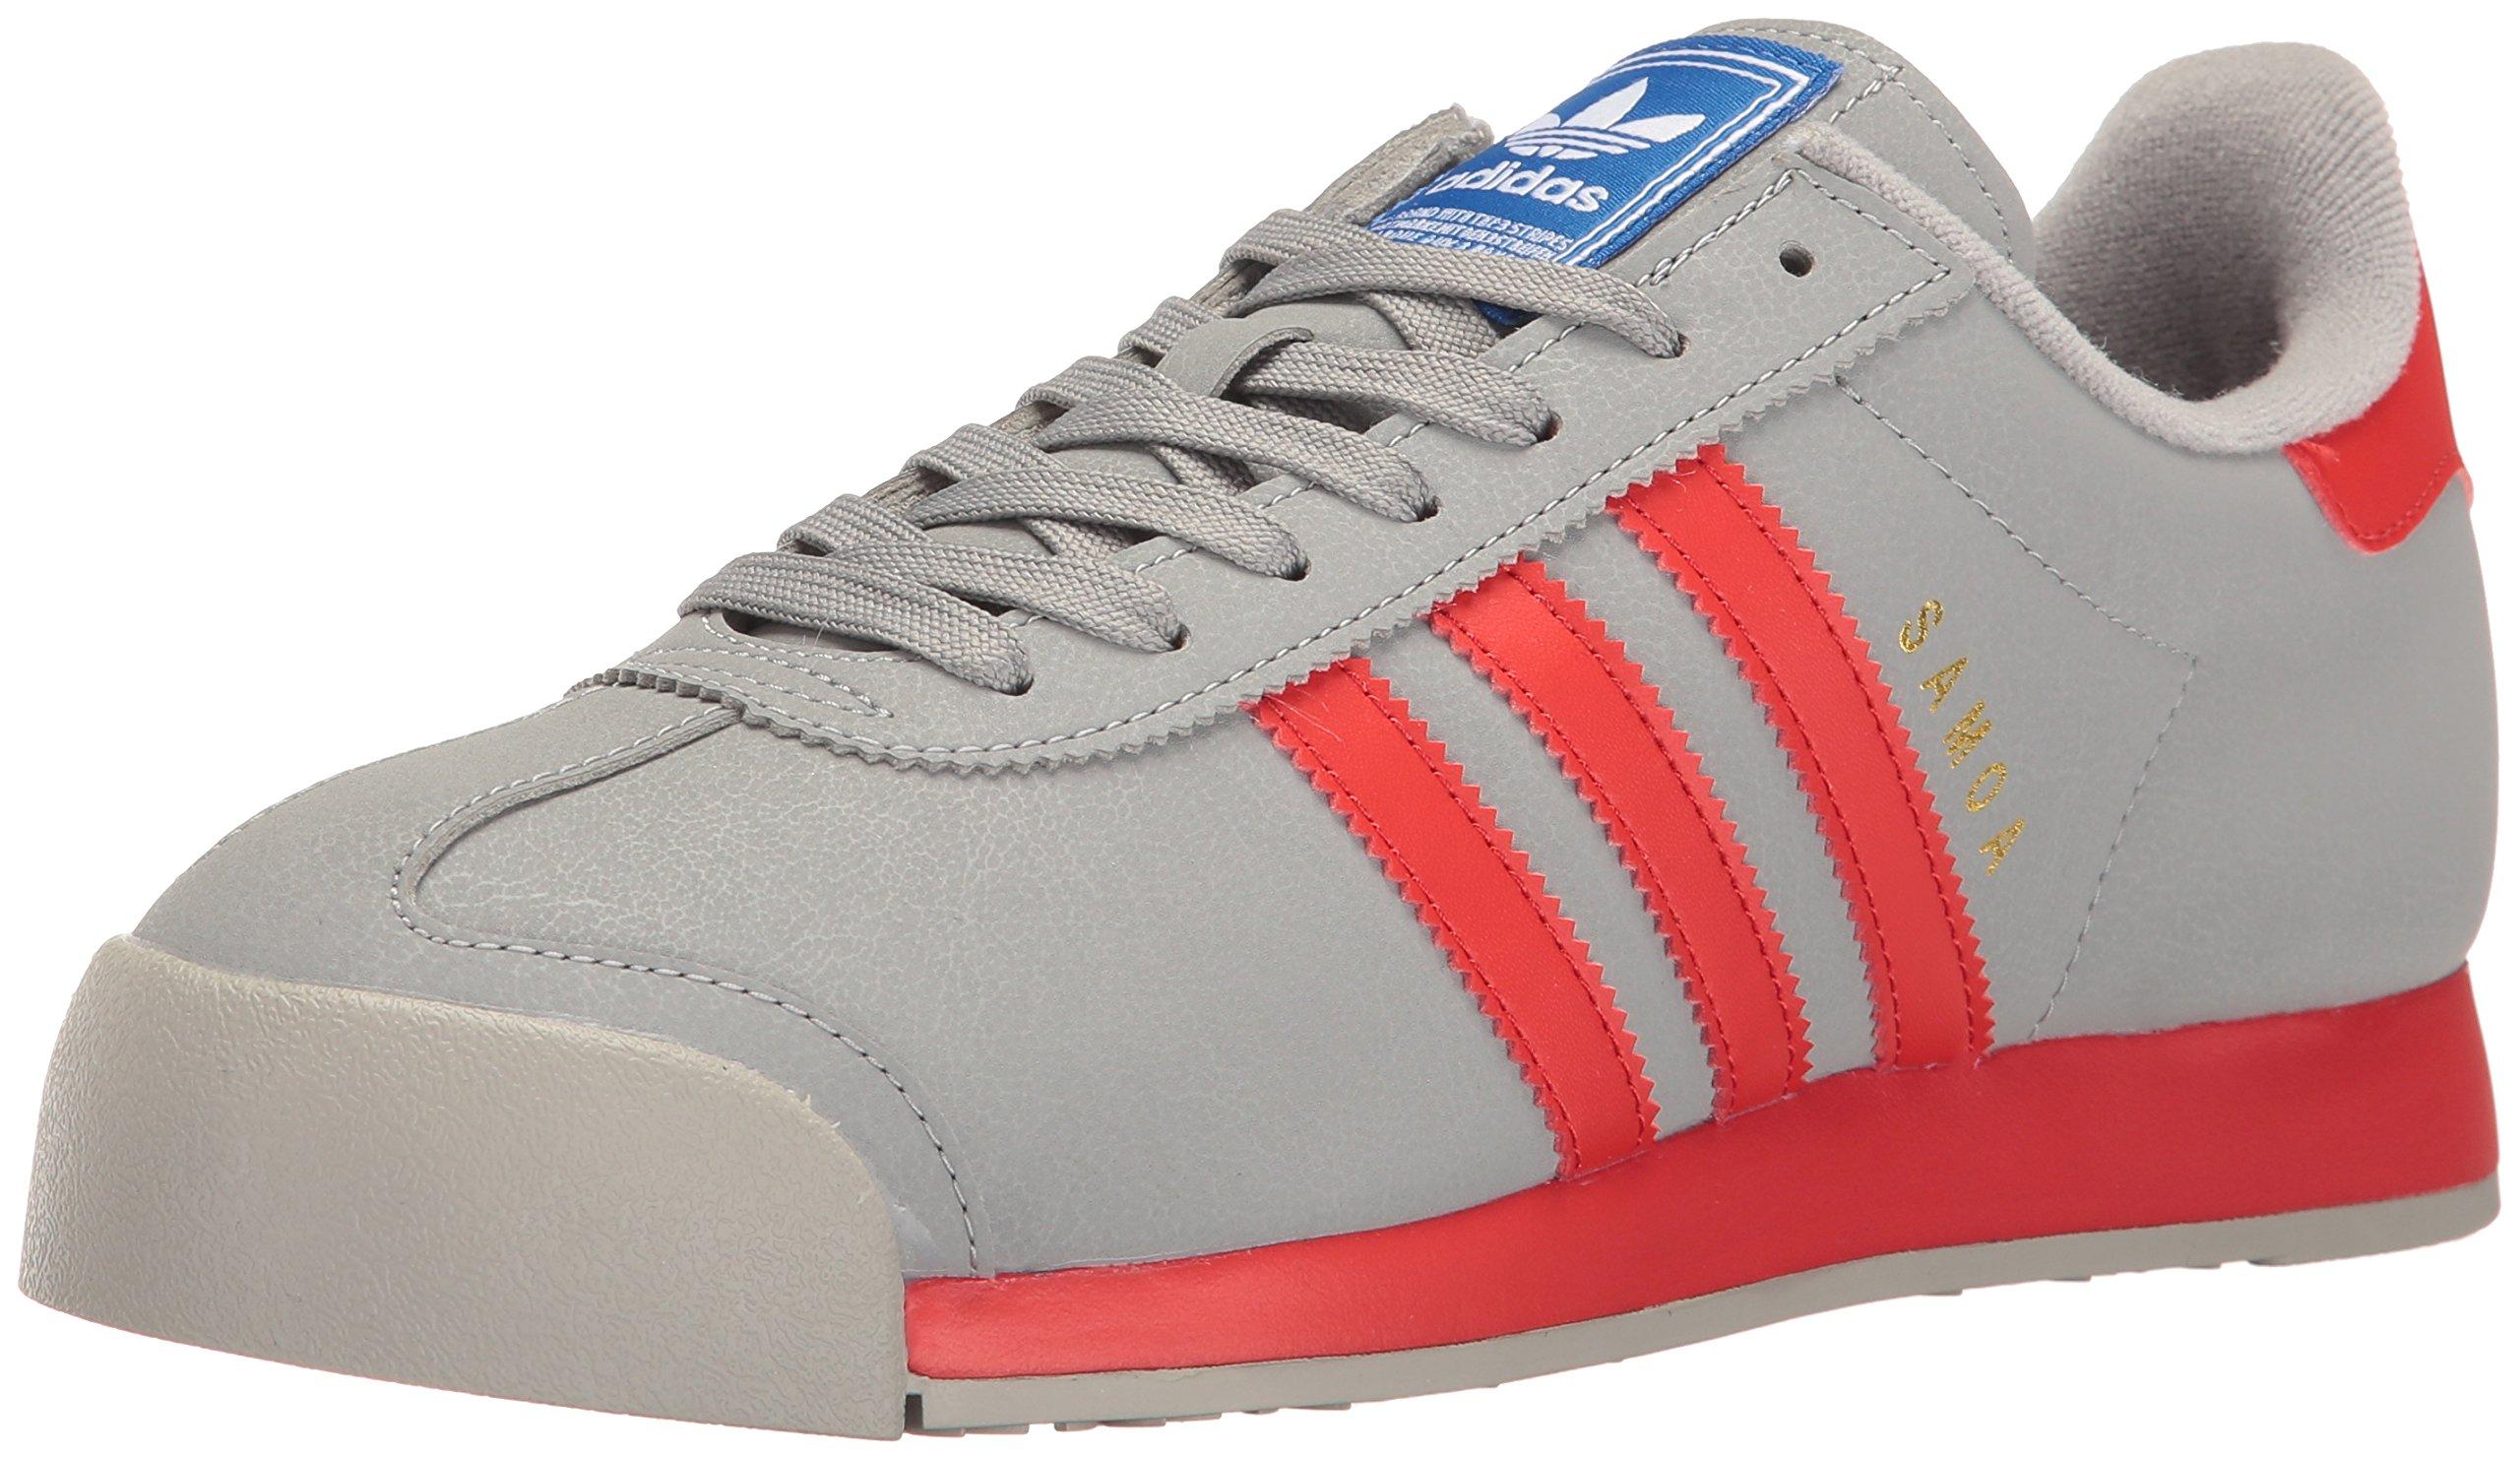 3f8992d5bea50 Galleon - Adidas Originals Men's Samoa Retro Sneaker Running Shoe ...